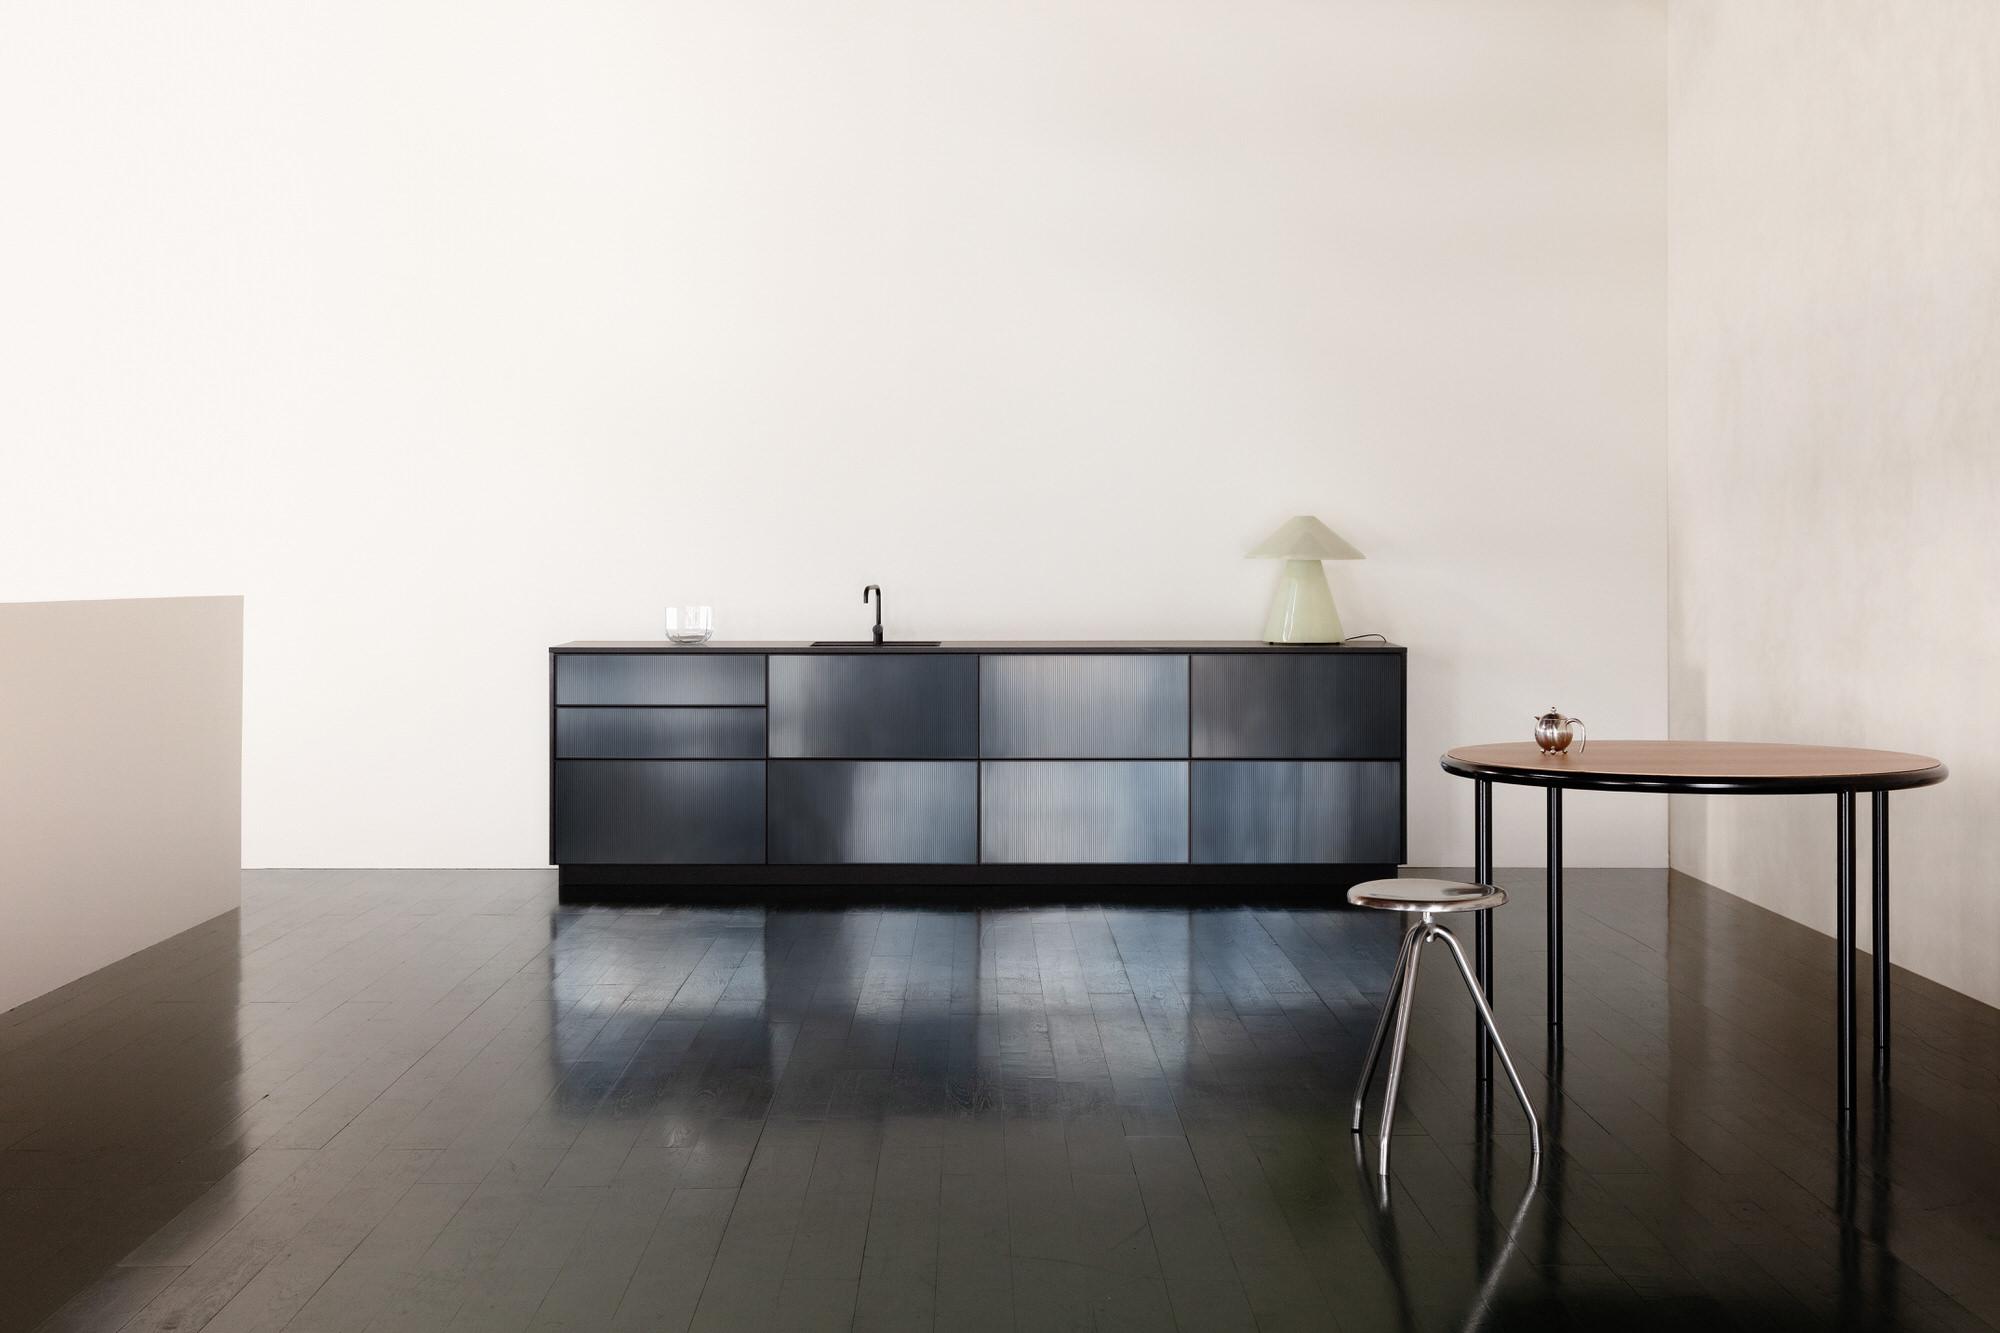 Jean Nouvel Reflect Reform Kitchen Design Yellowtrace 03